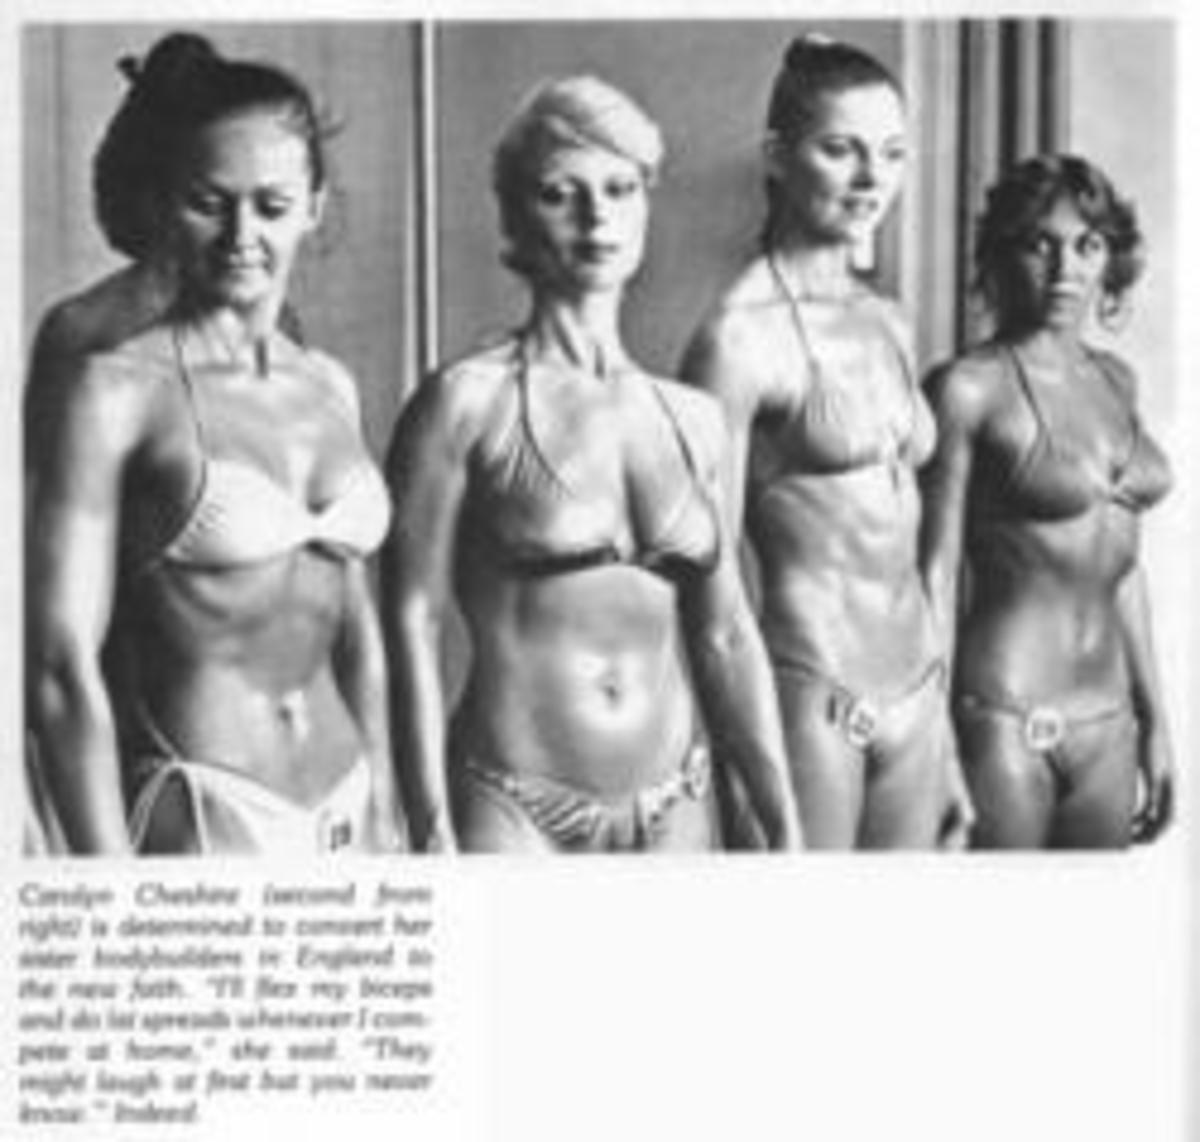 Late '70s Women's Bodybuilding Contest.